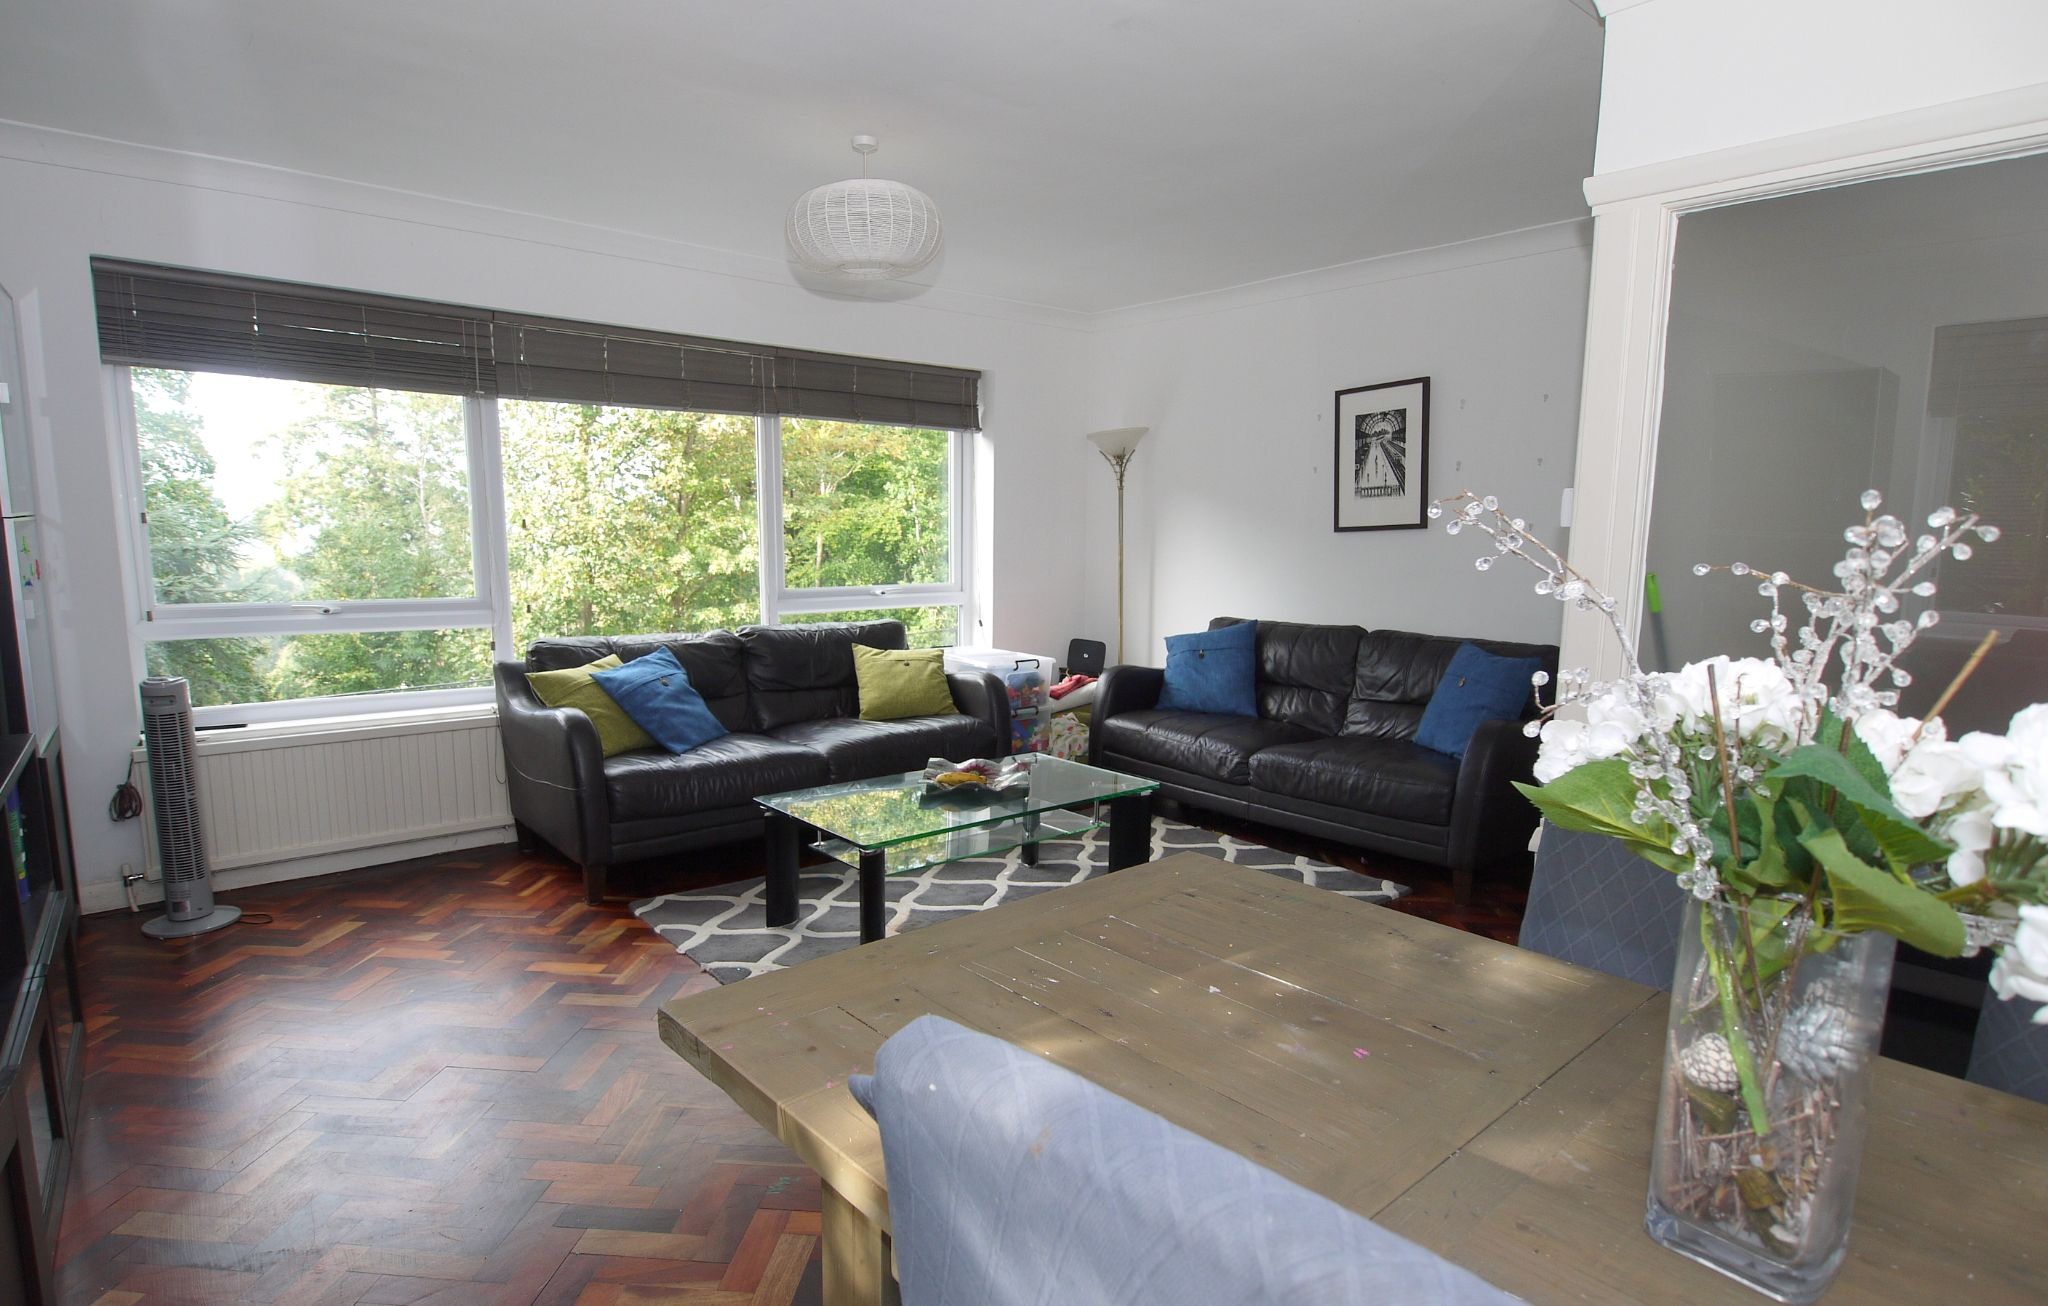 3 bedroom apartment Sale Agreed in Sevenoaks - Photograph 2